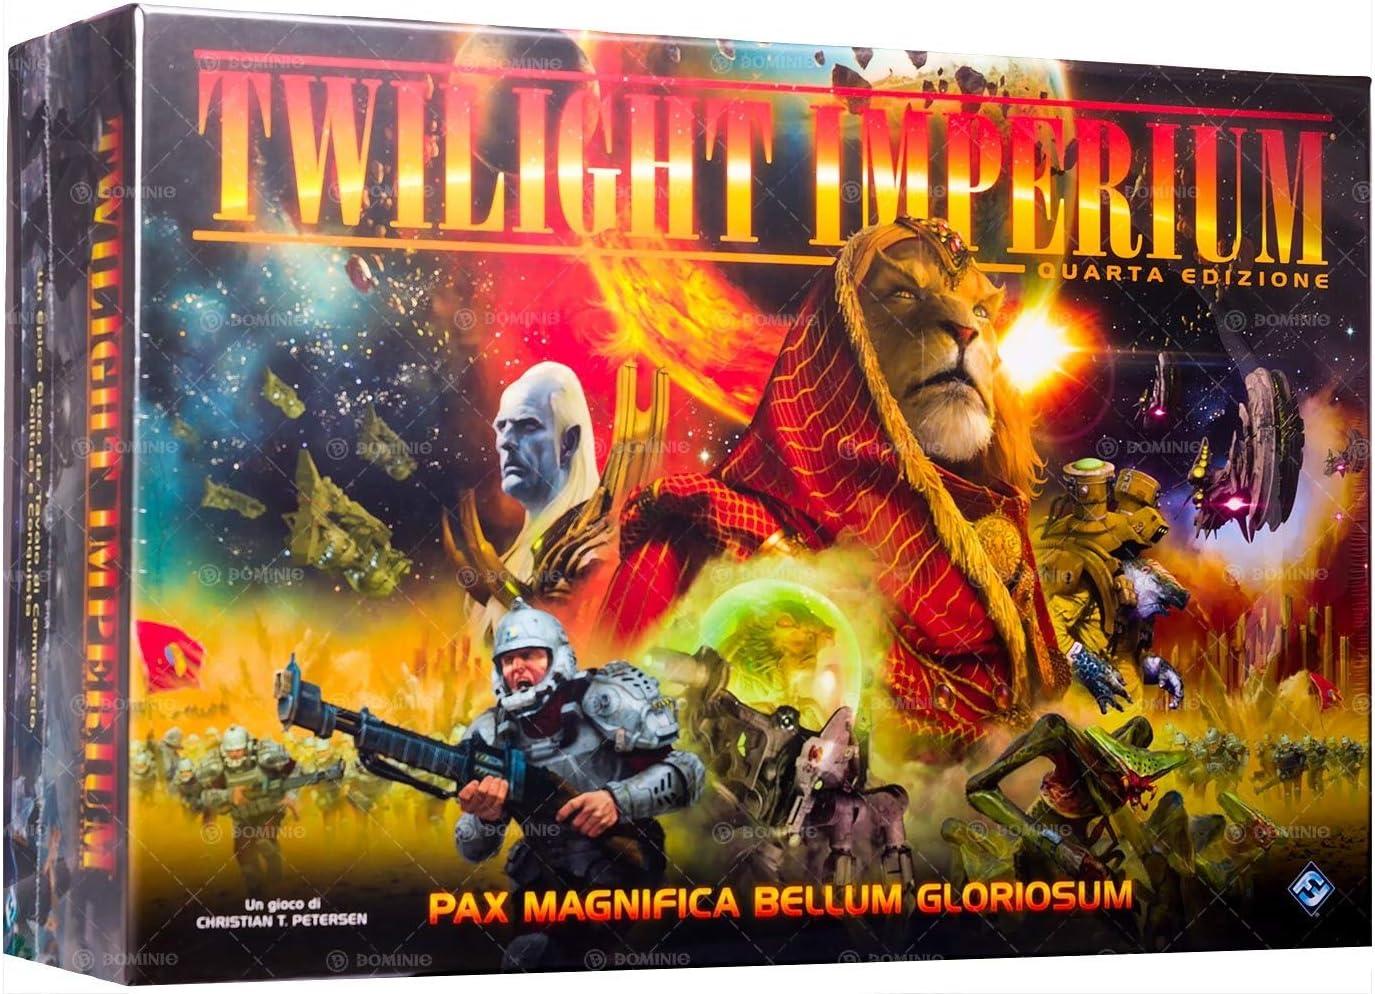 Asmodee - Twilight Imperium Quarta EDIZIONE - Italiano: Amazon.es: Juguetes y juegos